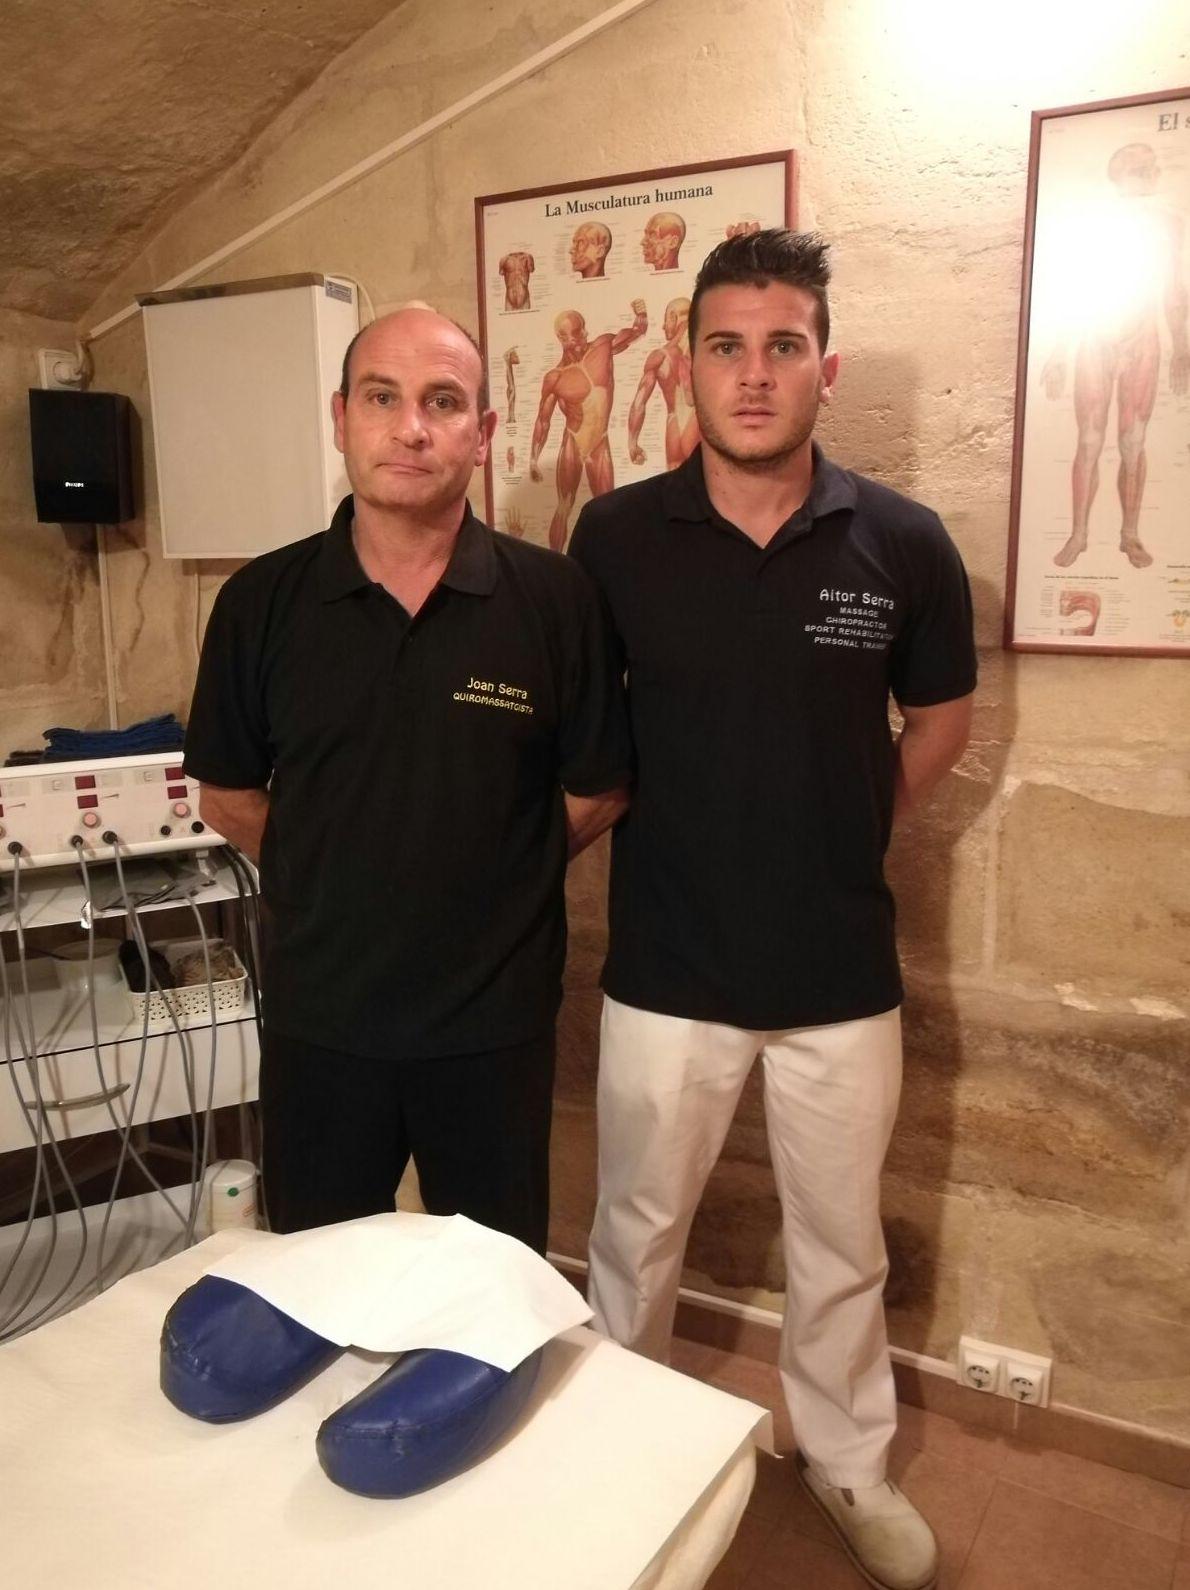 Joan Serra y Aitor Serra . Fisioterapeutas.